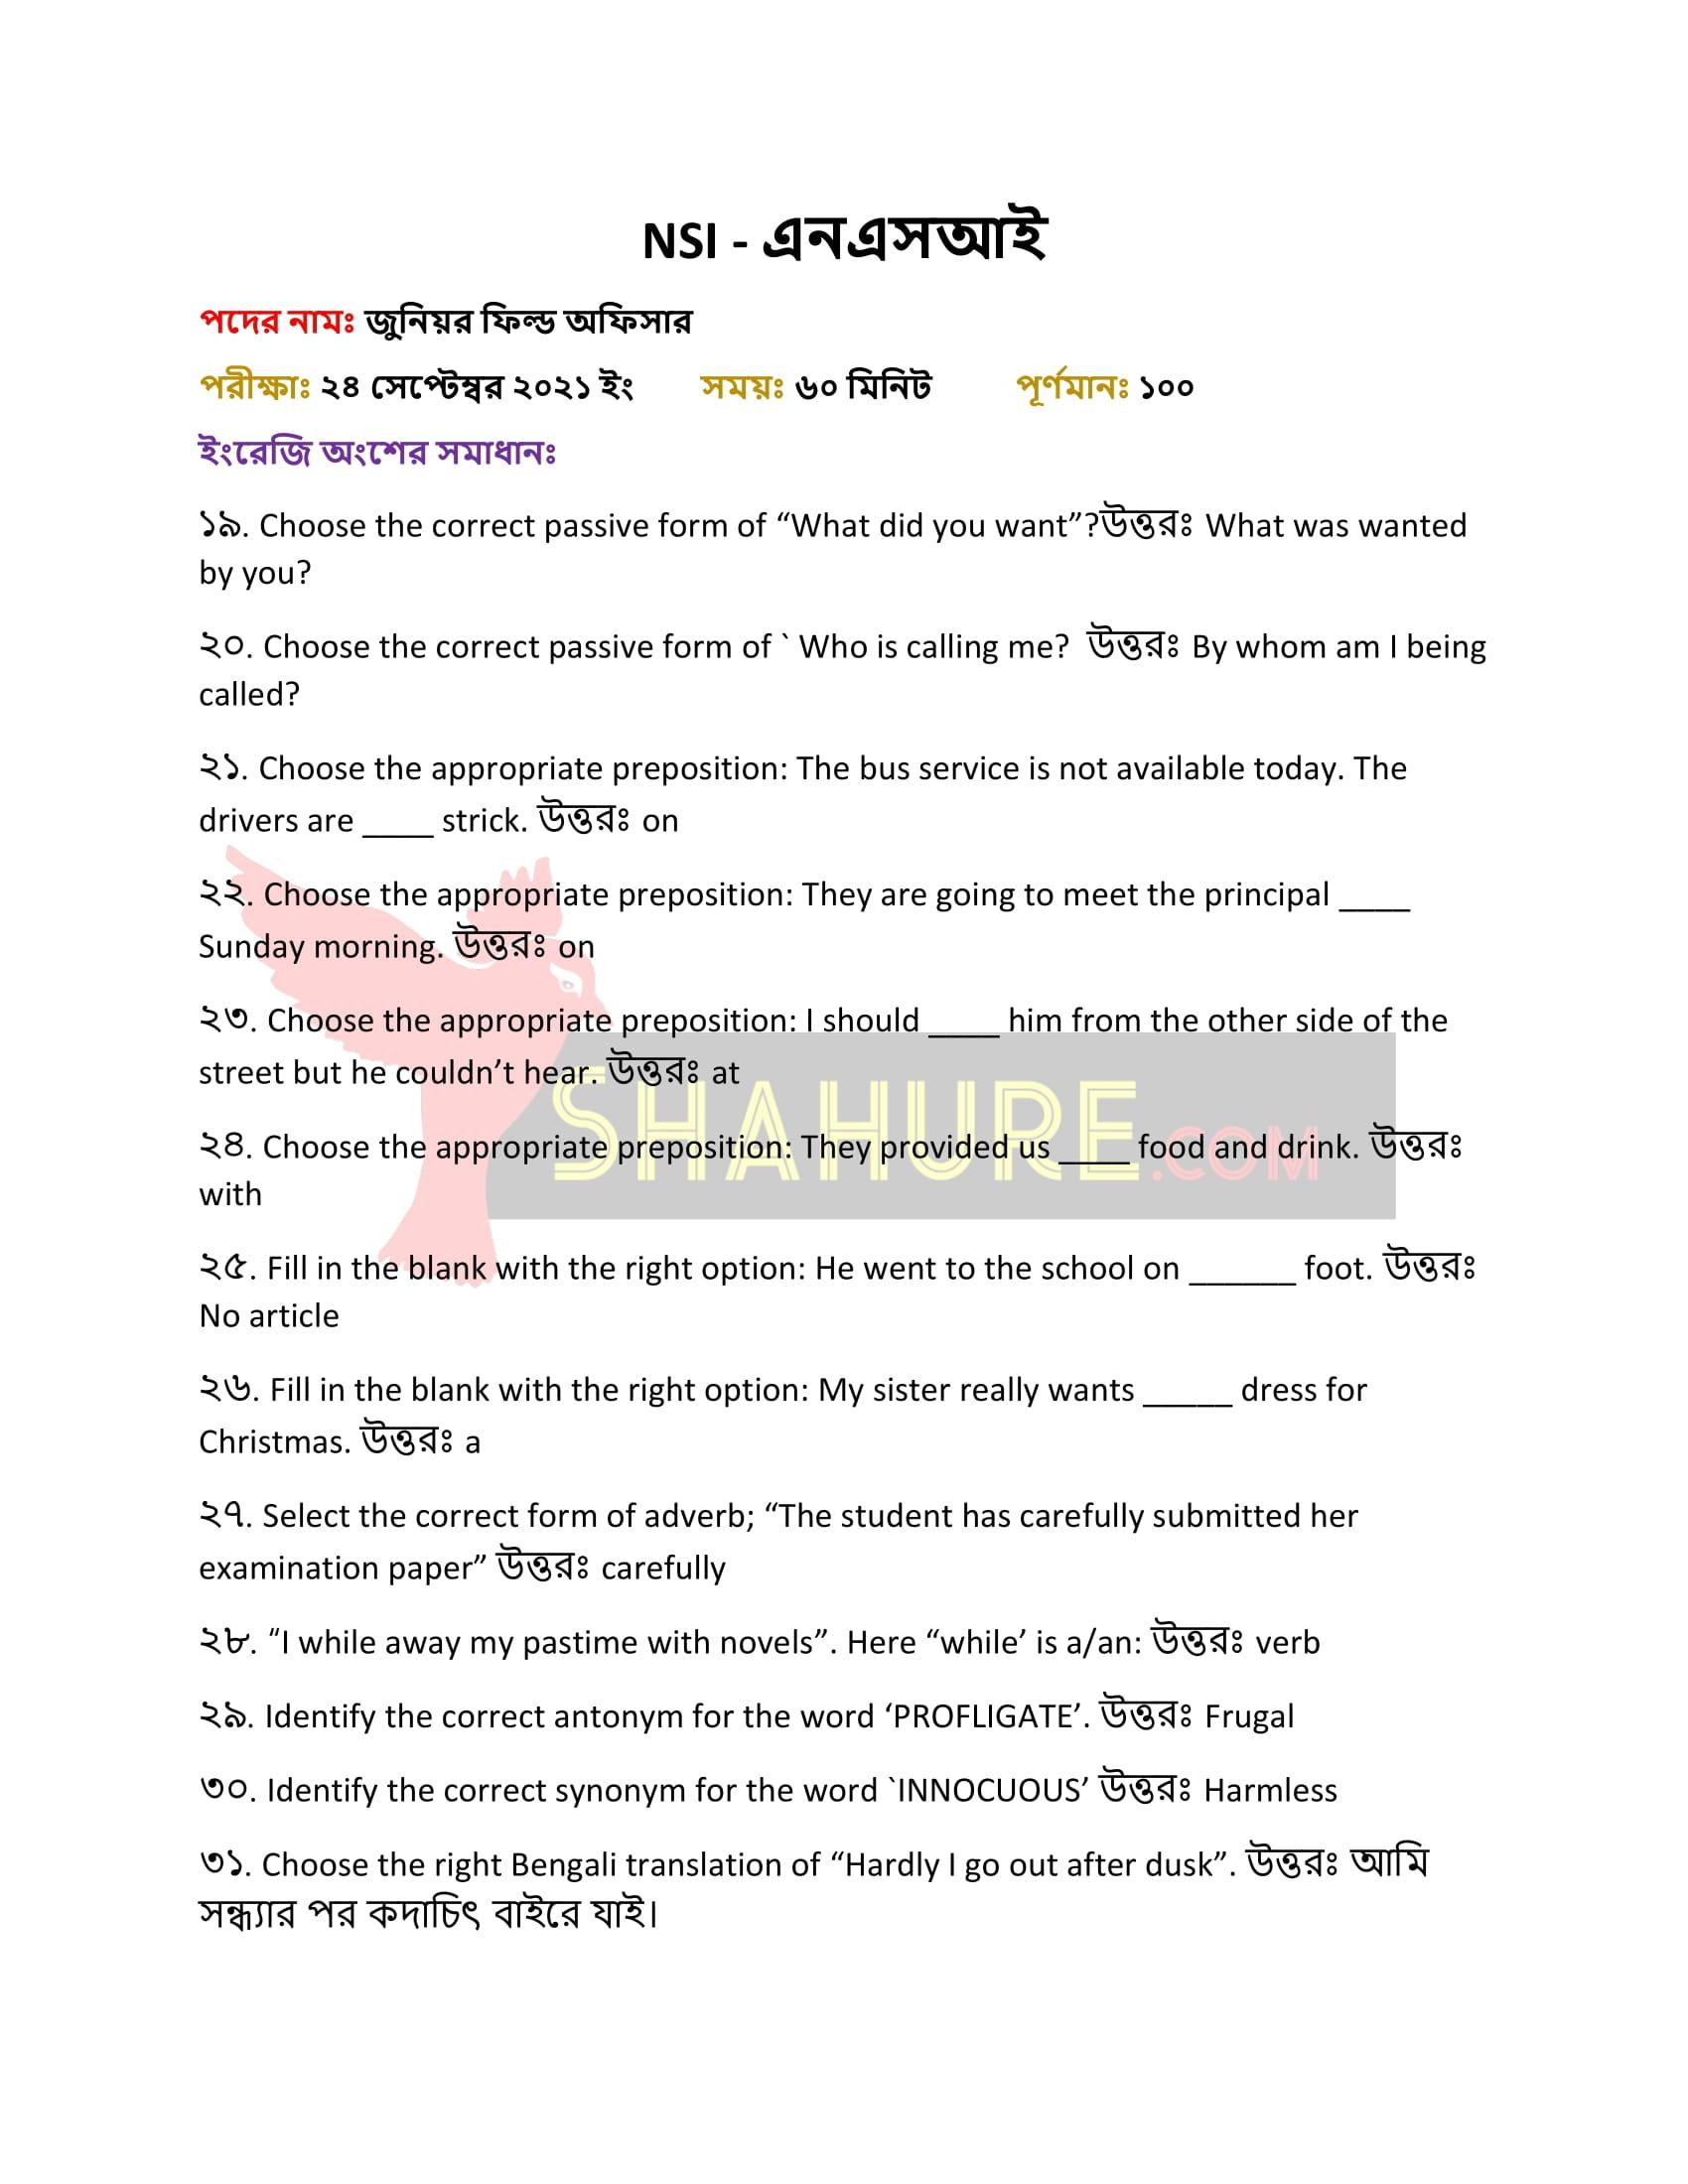 NSI Junior Field Officer Exam Question Solution English